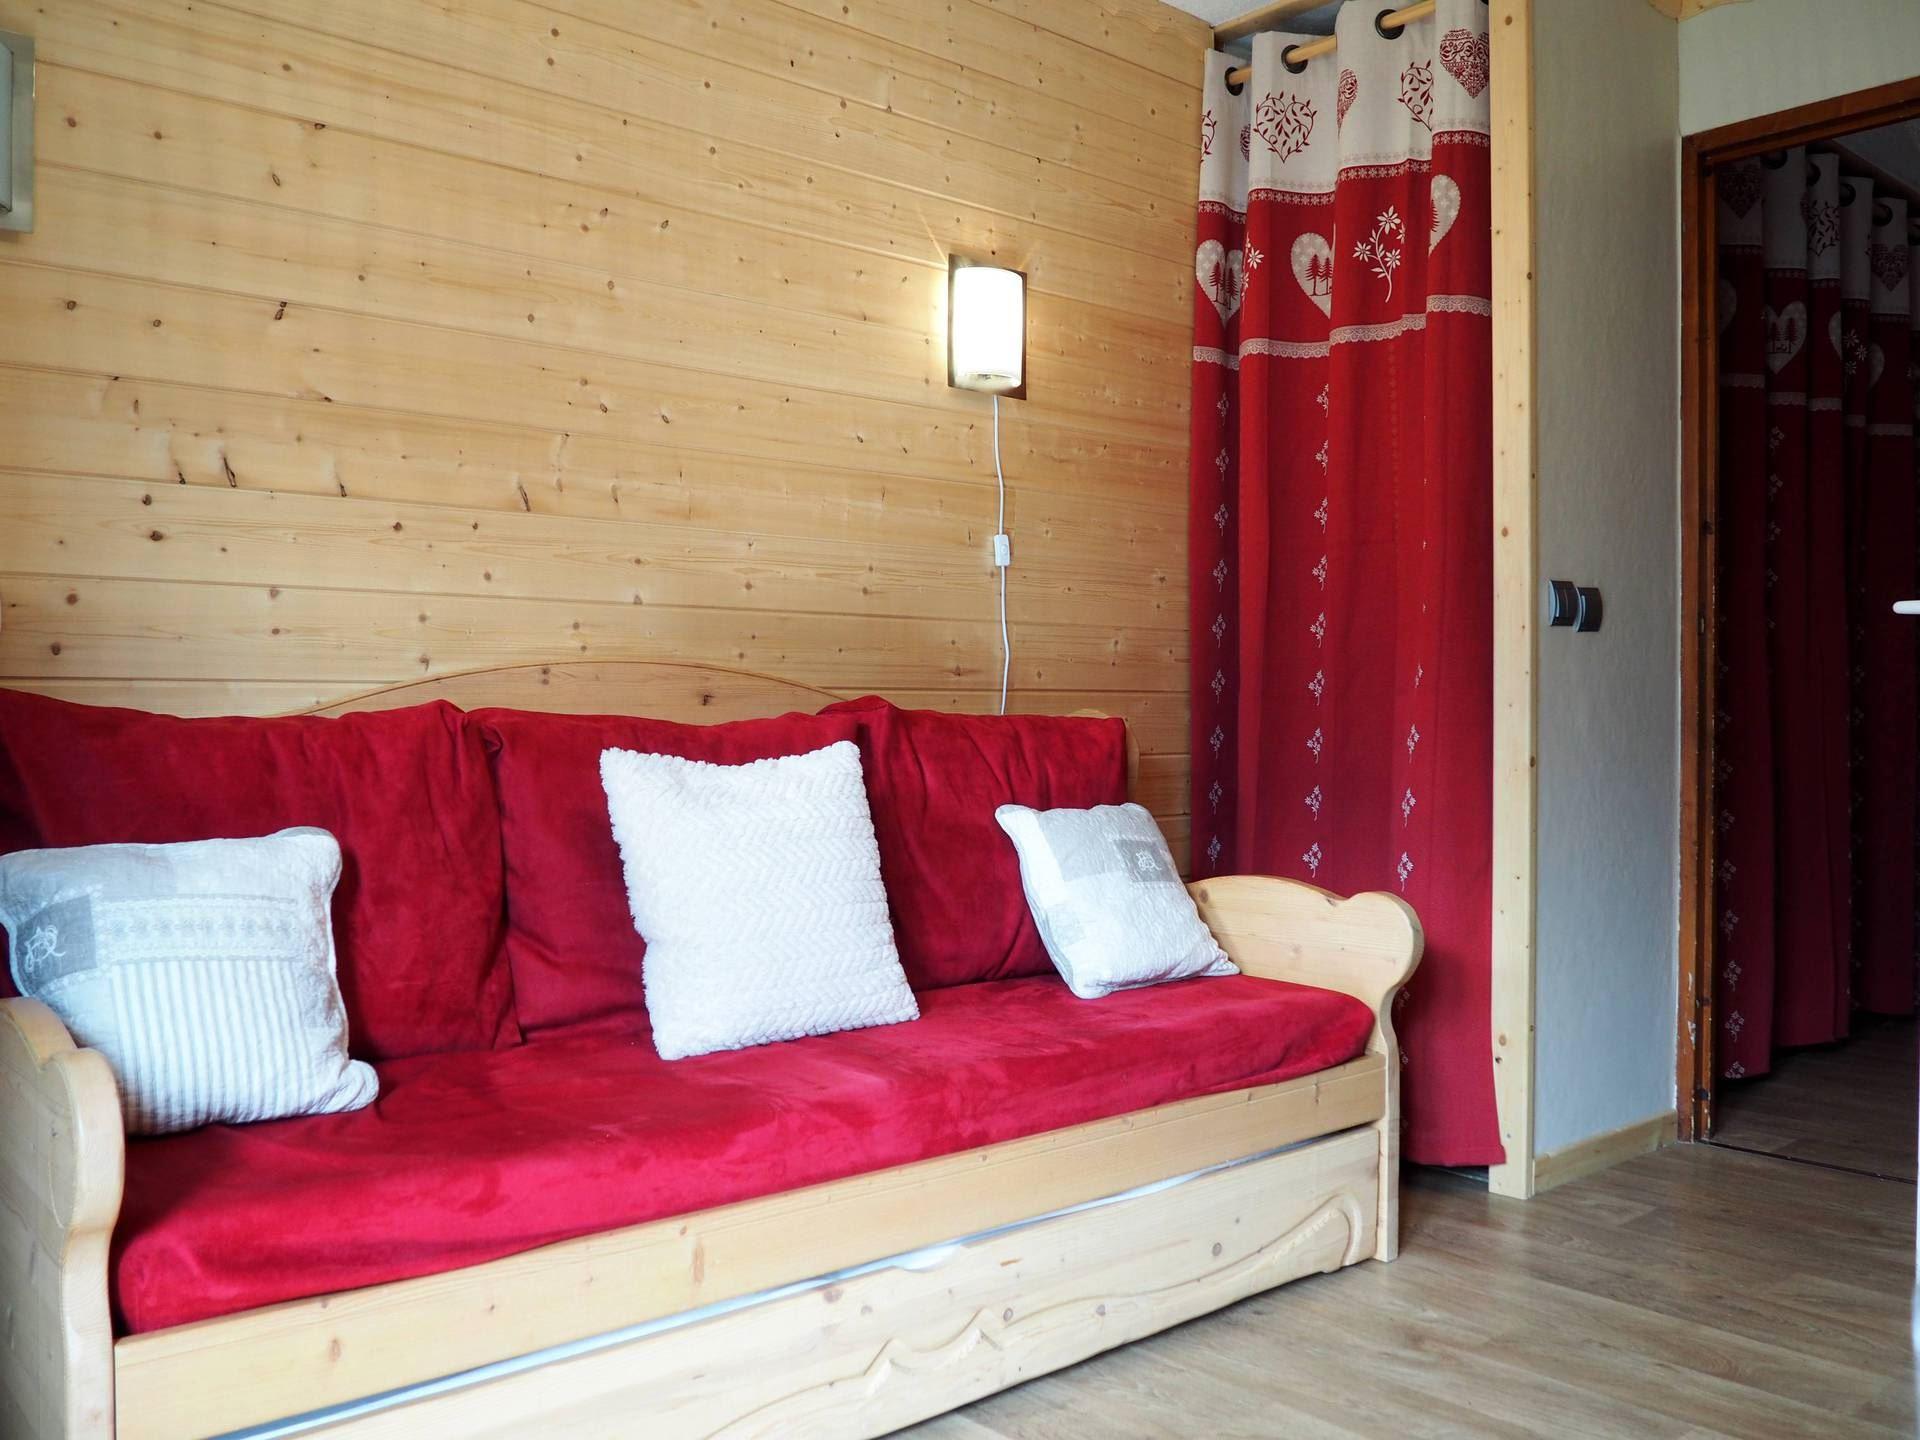 4 Pers Studio ski-in ski-out / BALCONS D'OLYMPIE 407